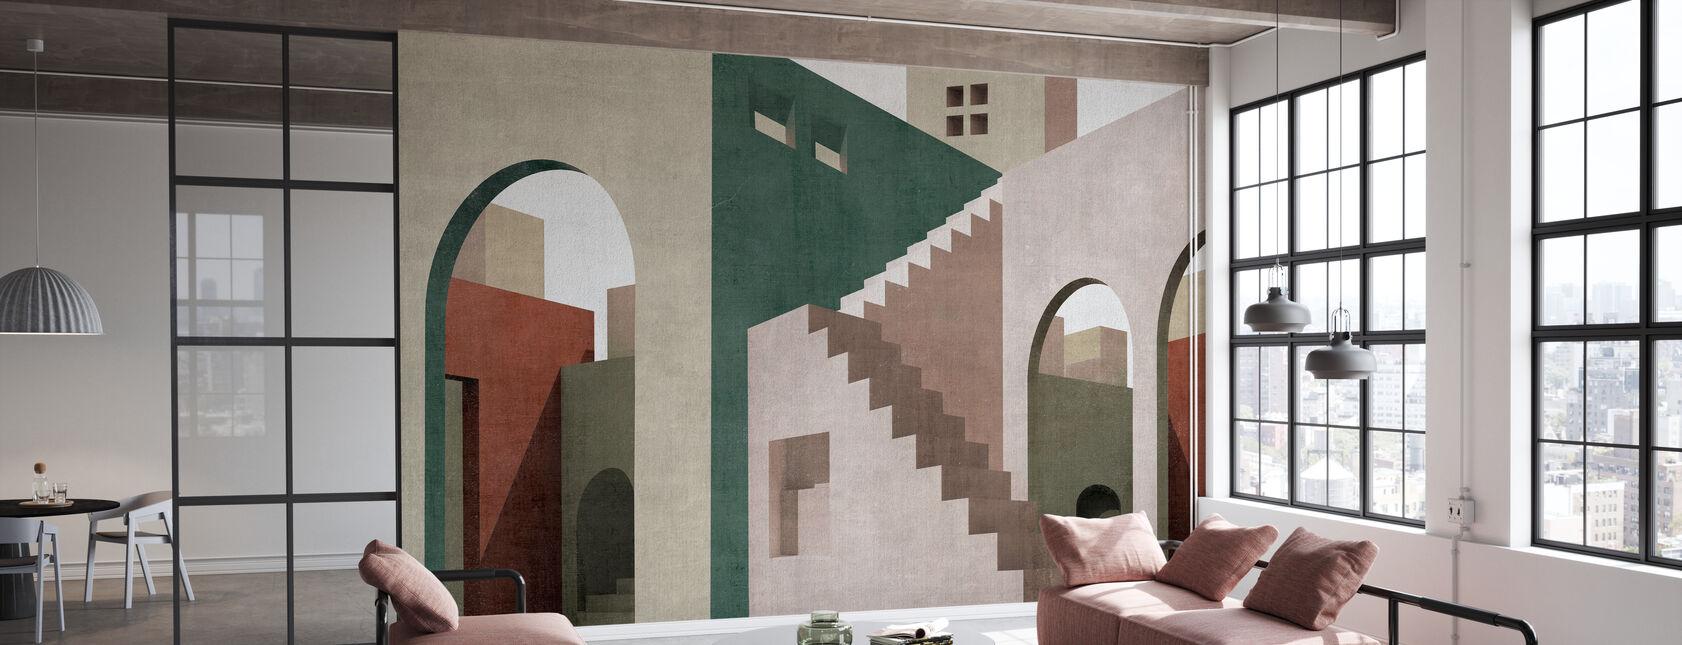 Moroccan City II - Wallpaper - Office